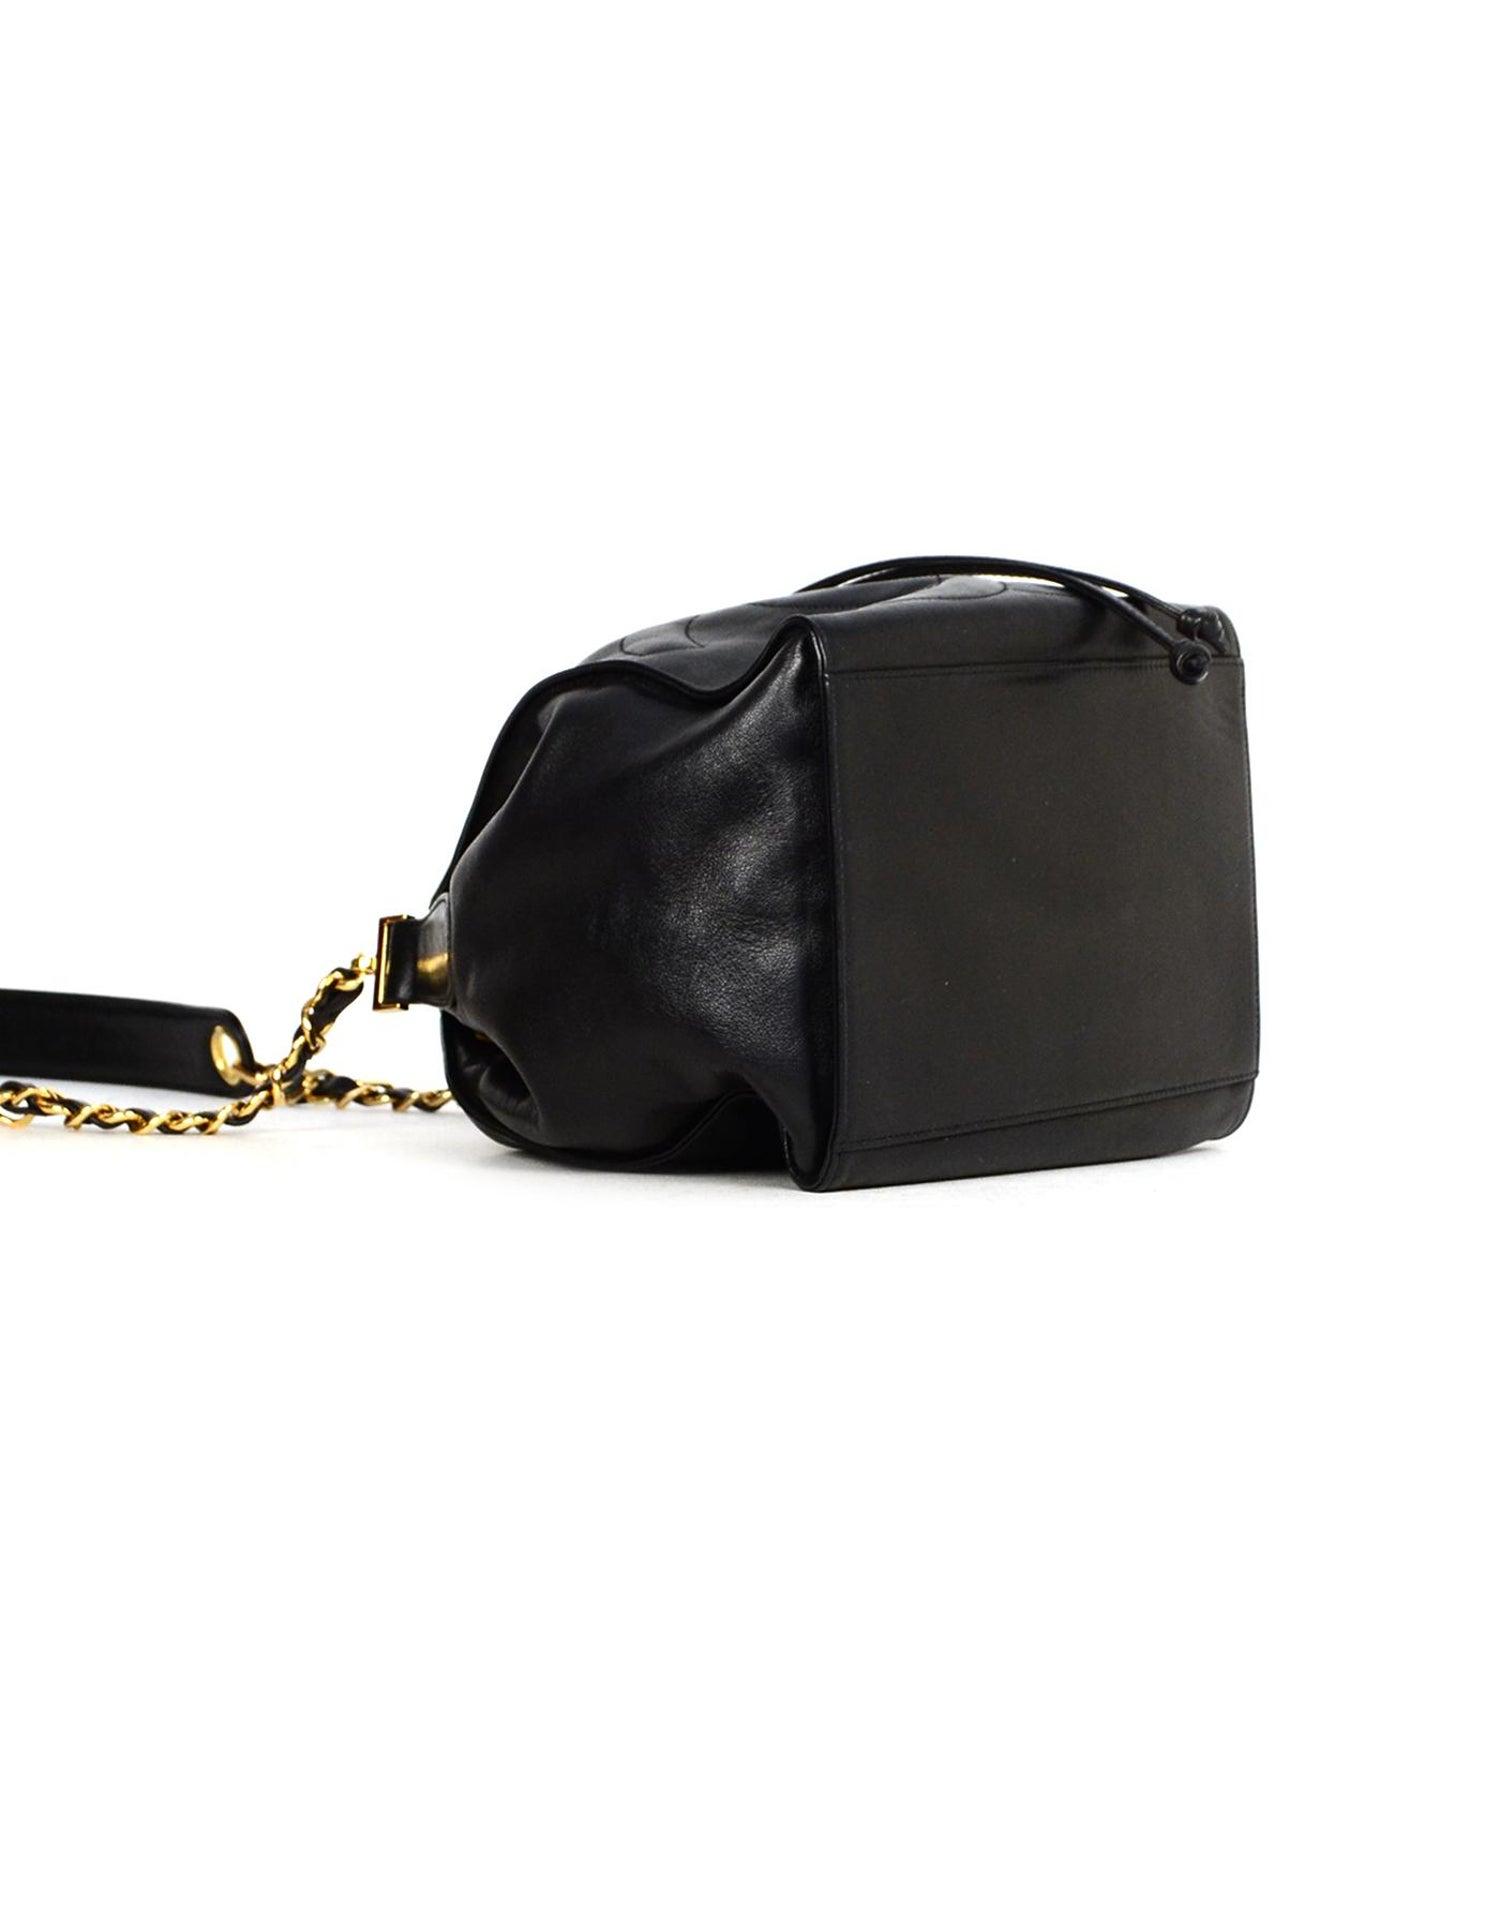 f4369bfbb8f9 Chanel Vintage Black Lambskin Leather CC Bucket Crossbody Bag W/ Insert For  Sale at 1stdibs